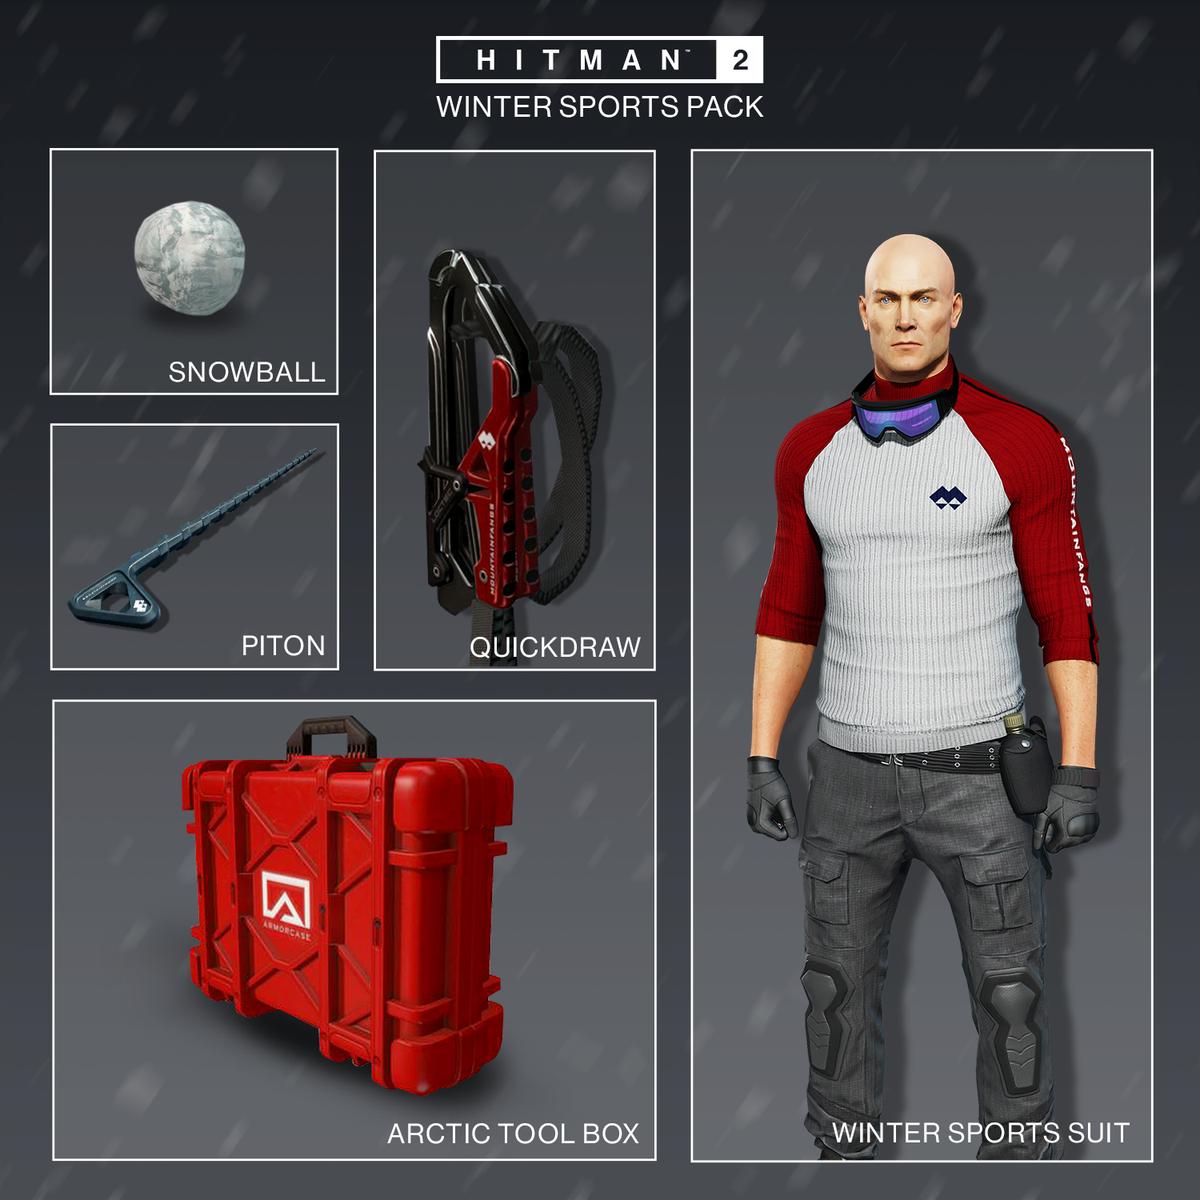 Hitman 2 - Winter Sports Pack items